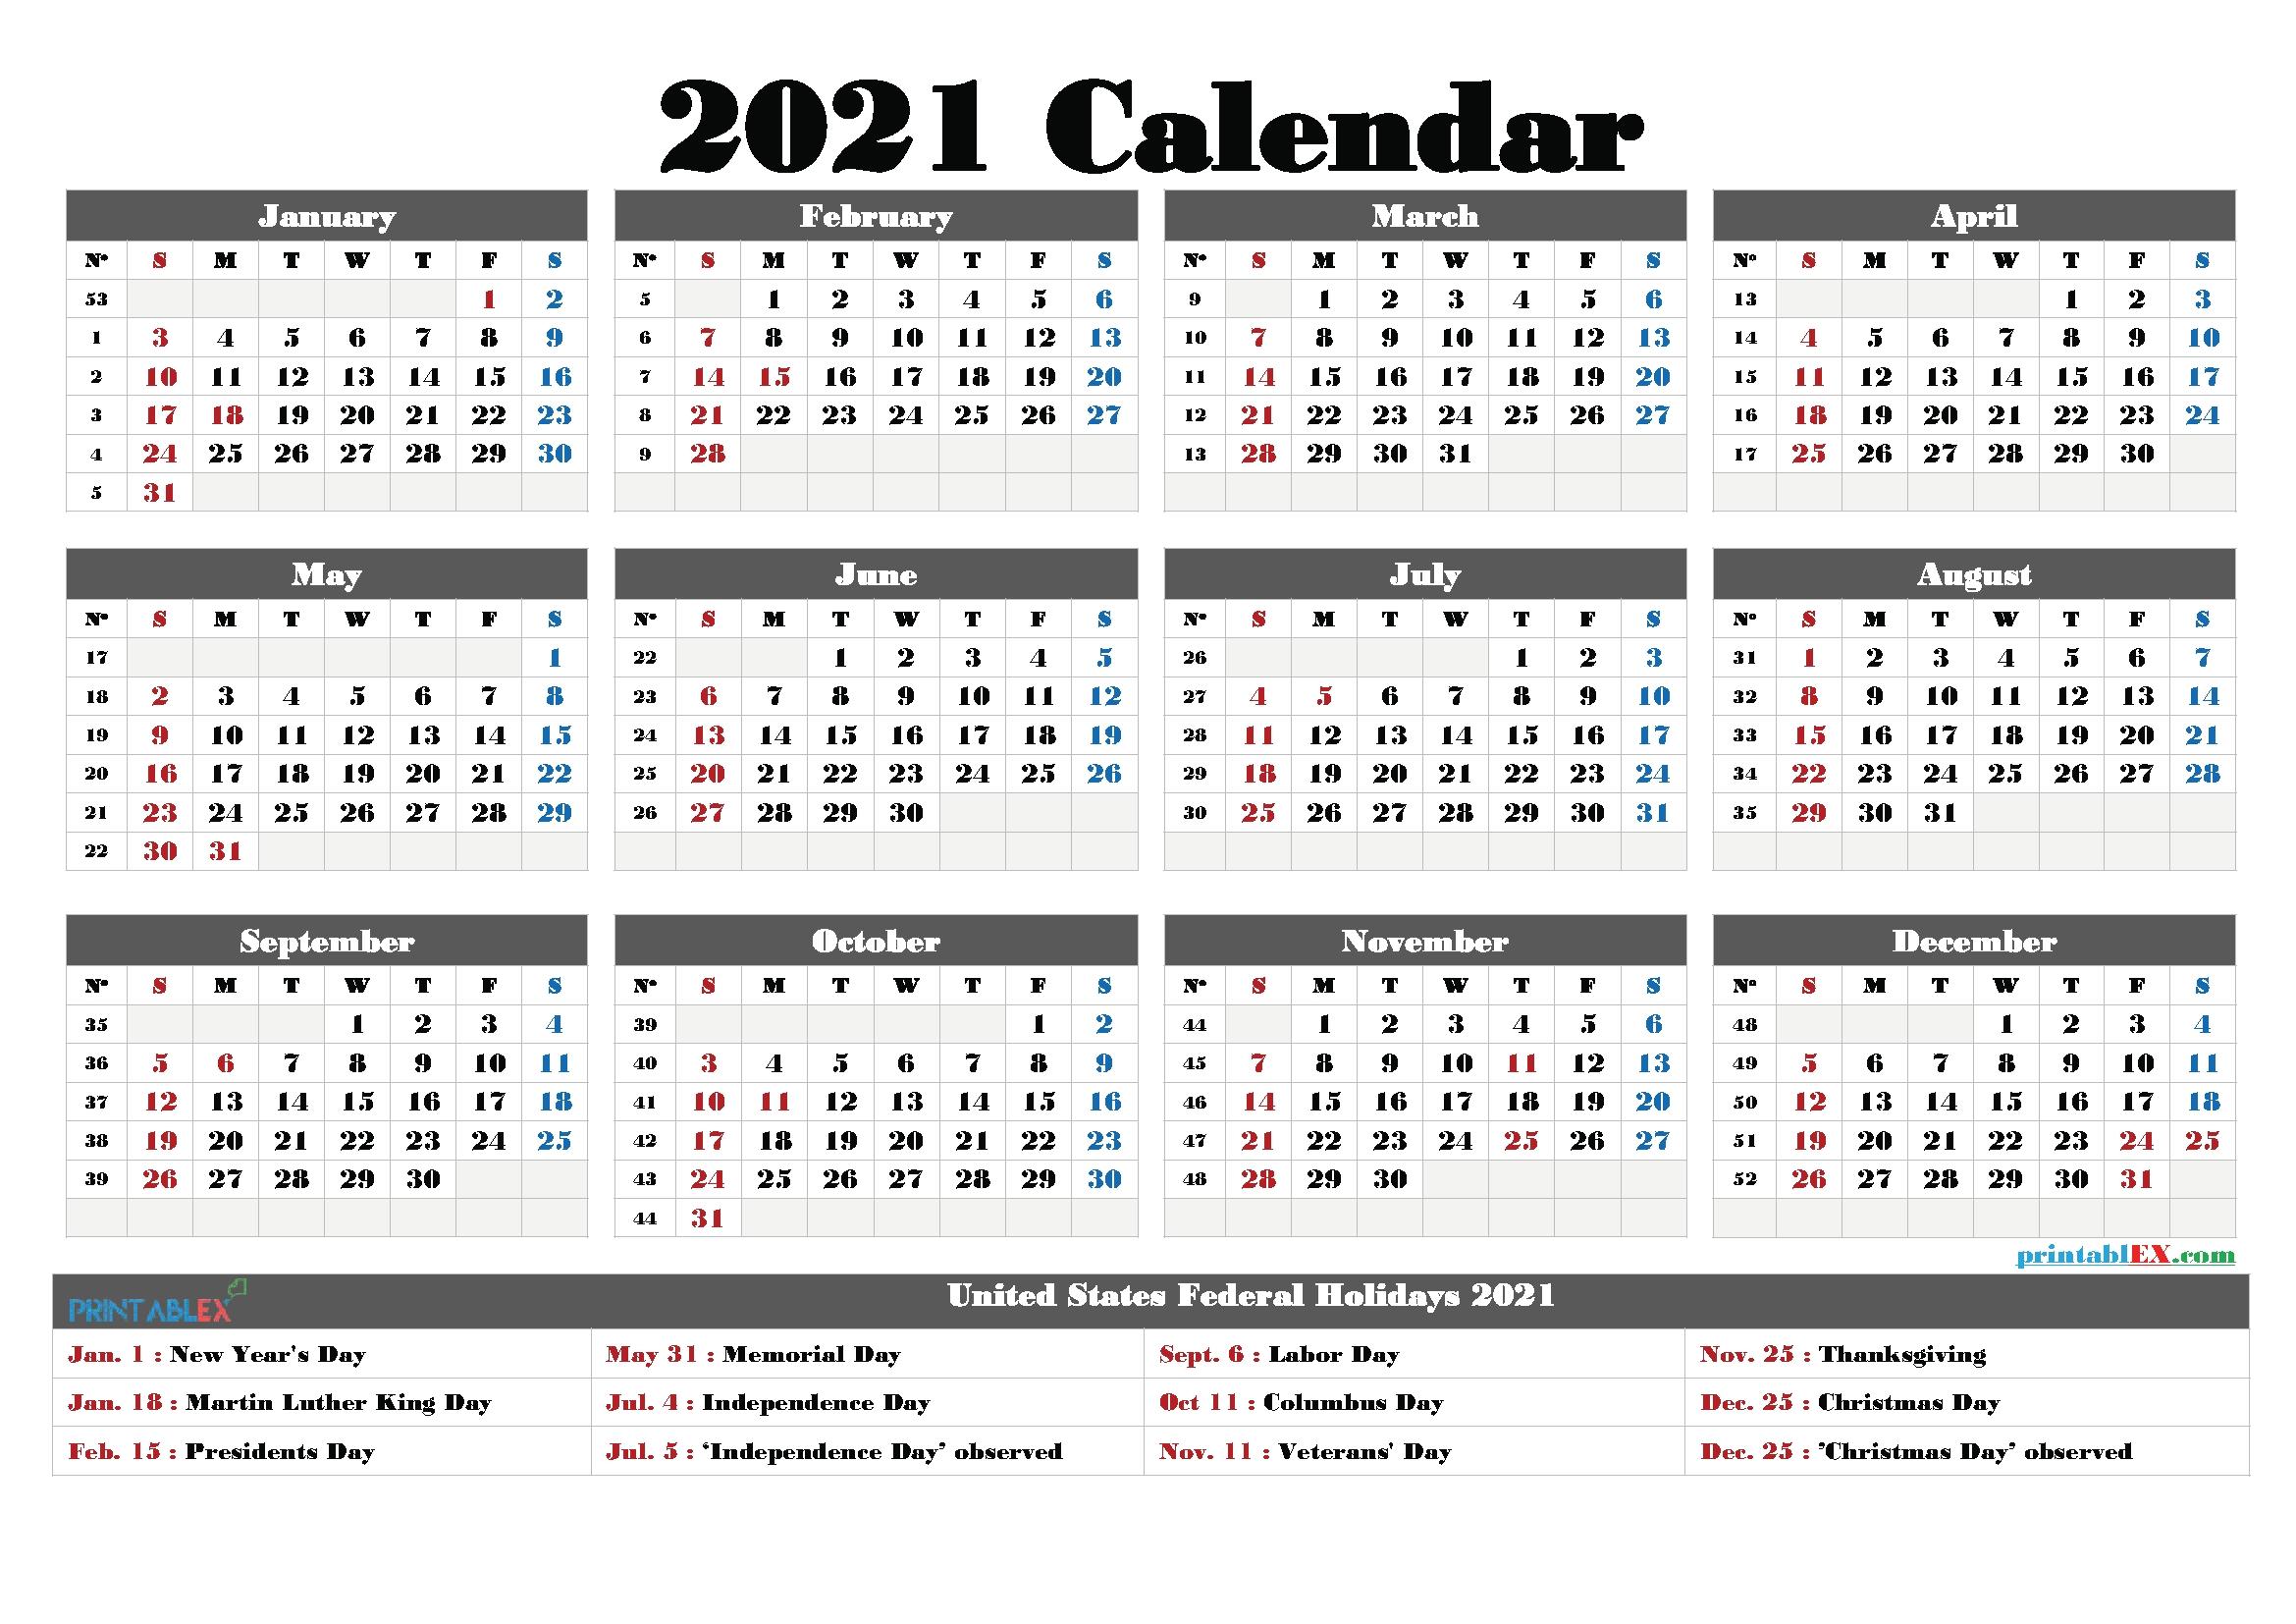 Federal Holidays 2021 Calendar - Example Calendar Printable